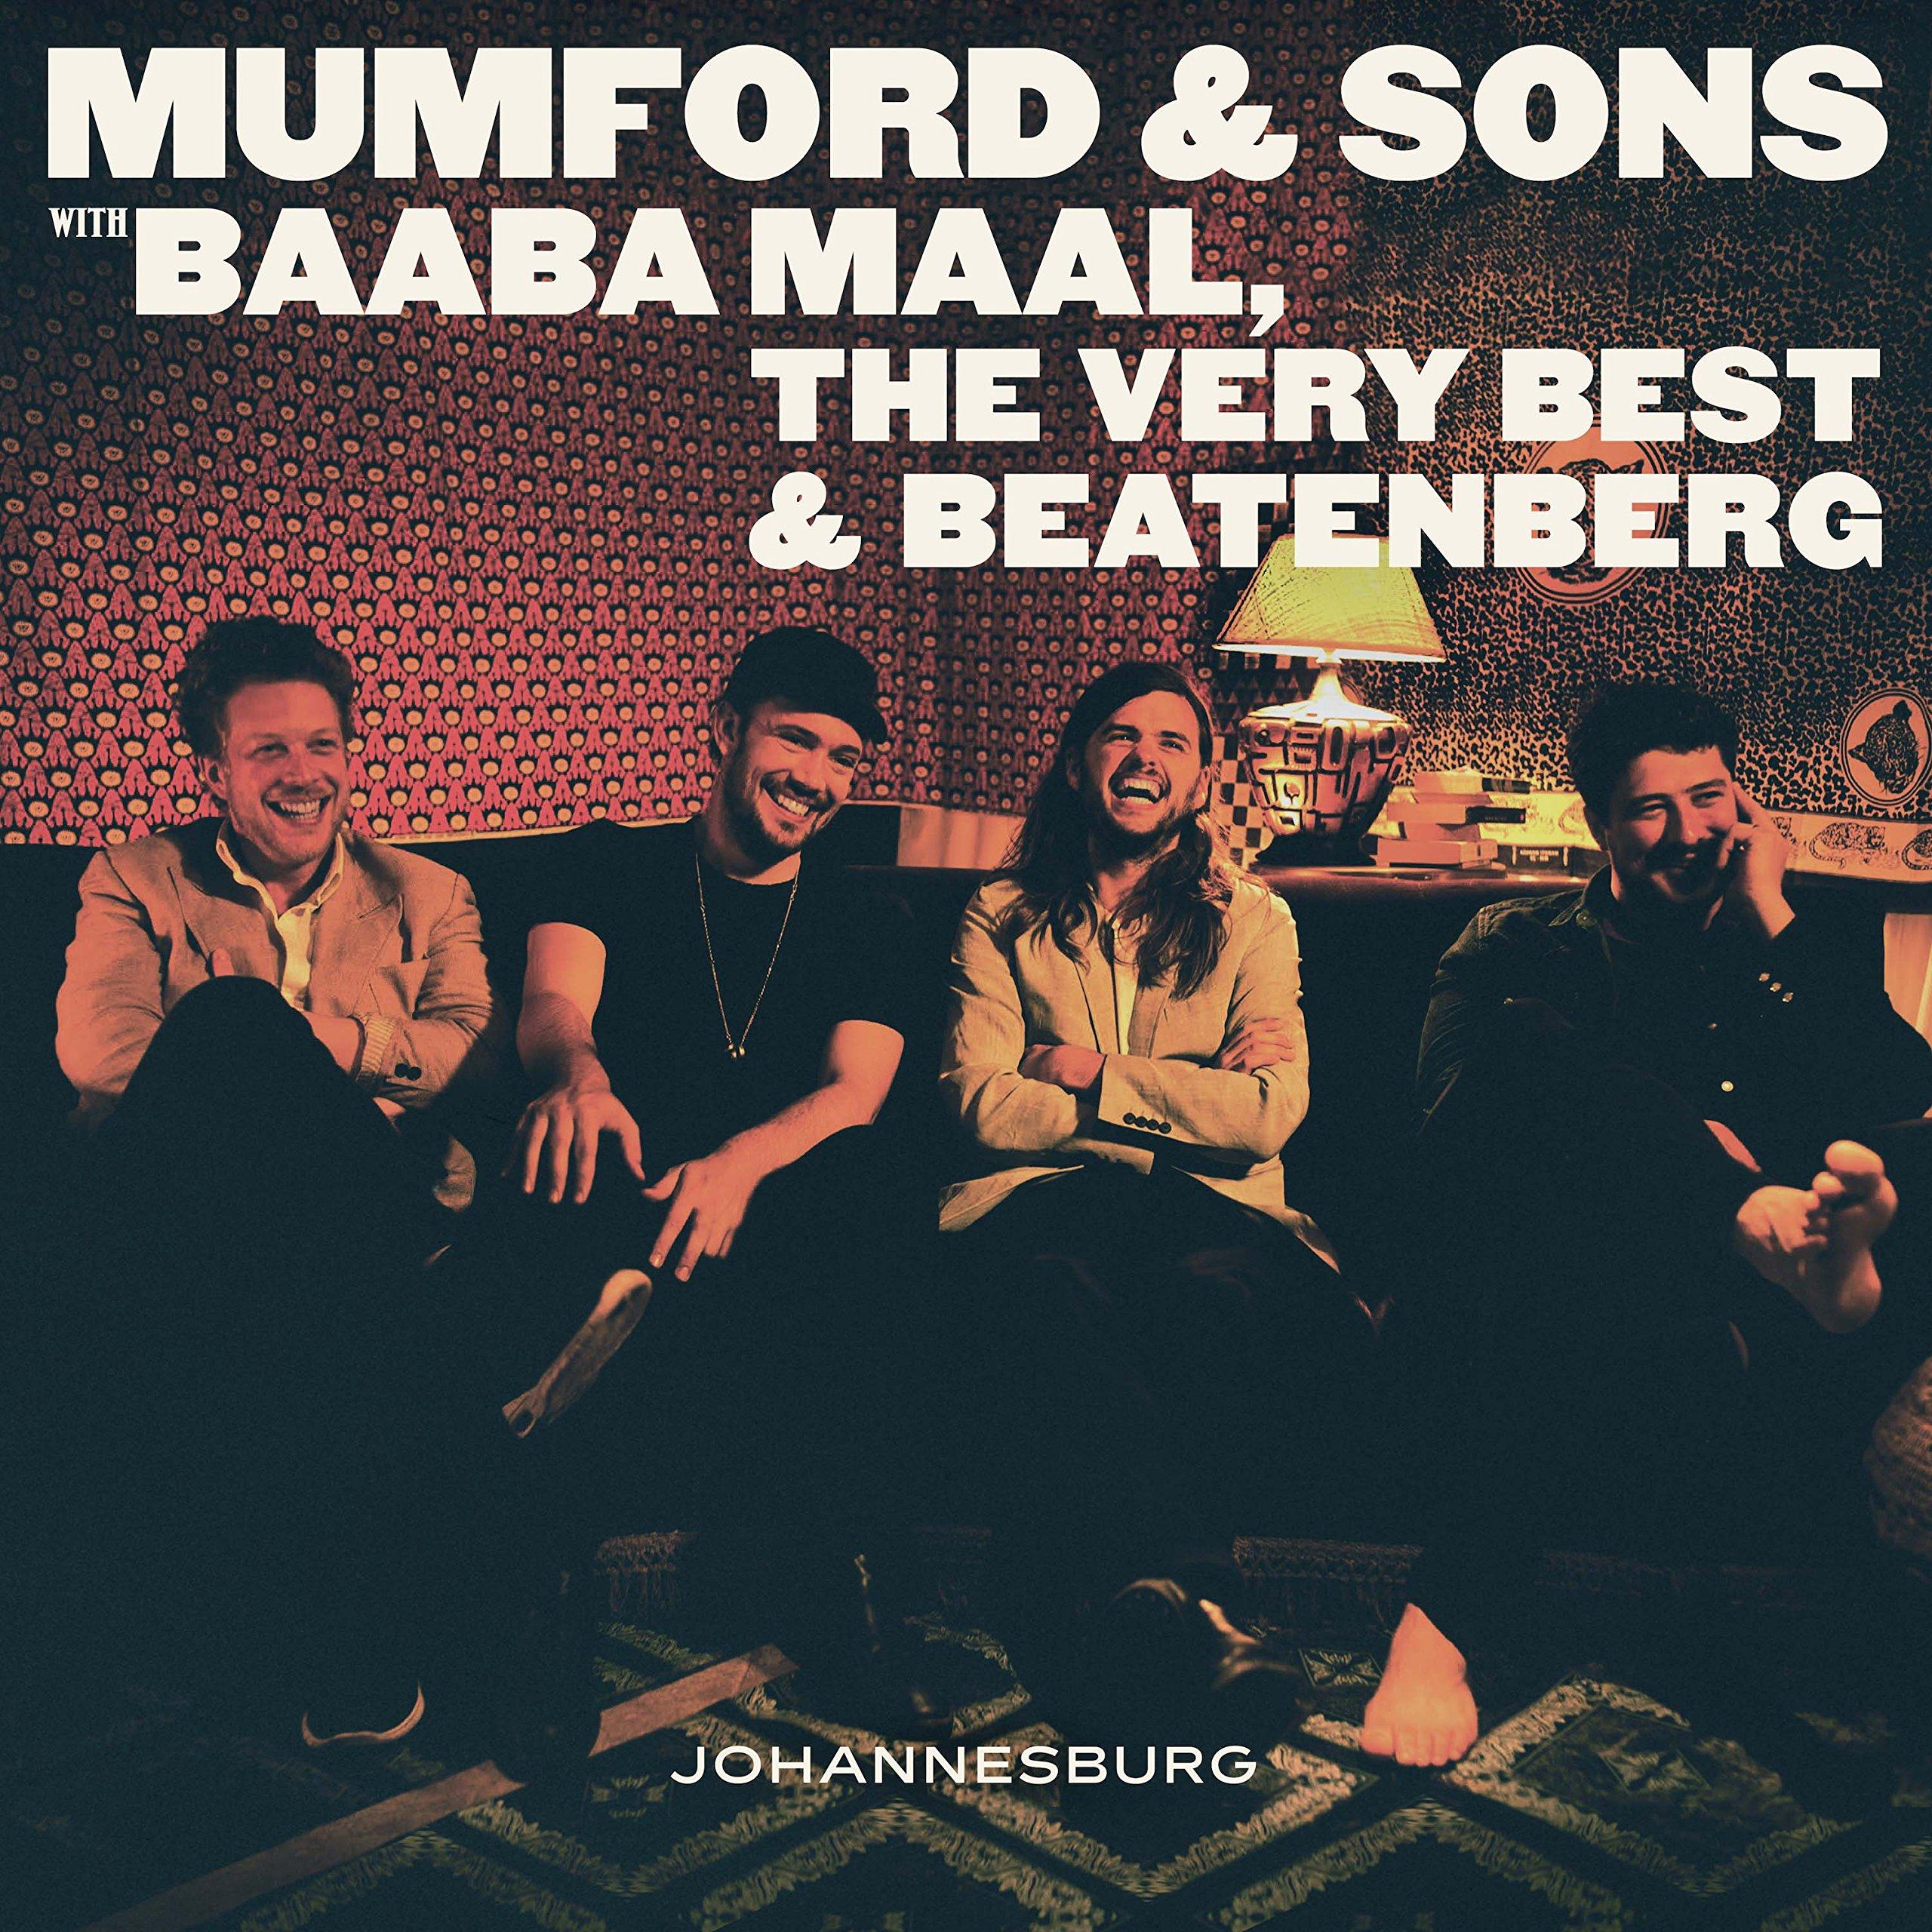 Vinilo : Mumford & Sons - Johannesburg (Extended Play, 10-Inch Vinyl)